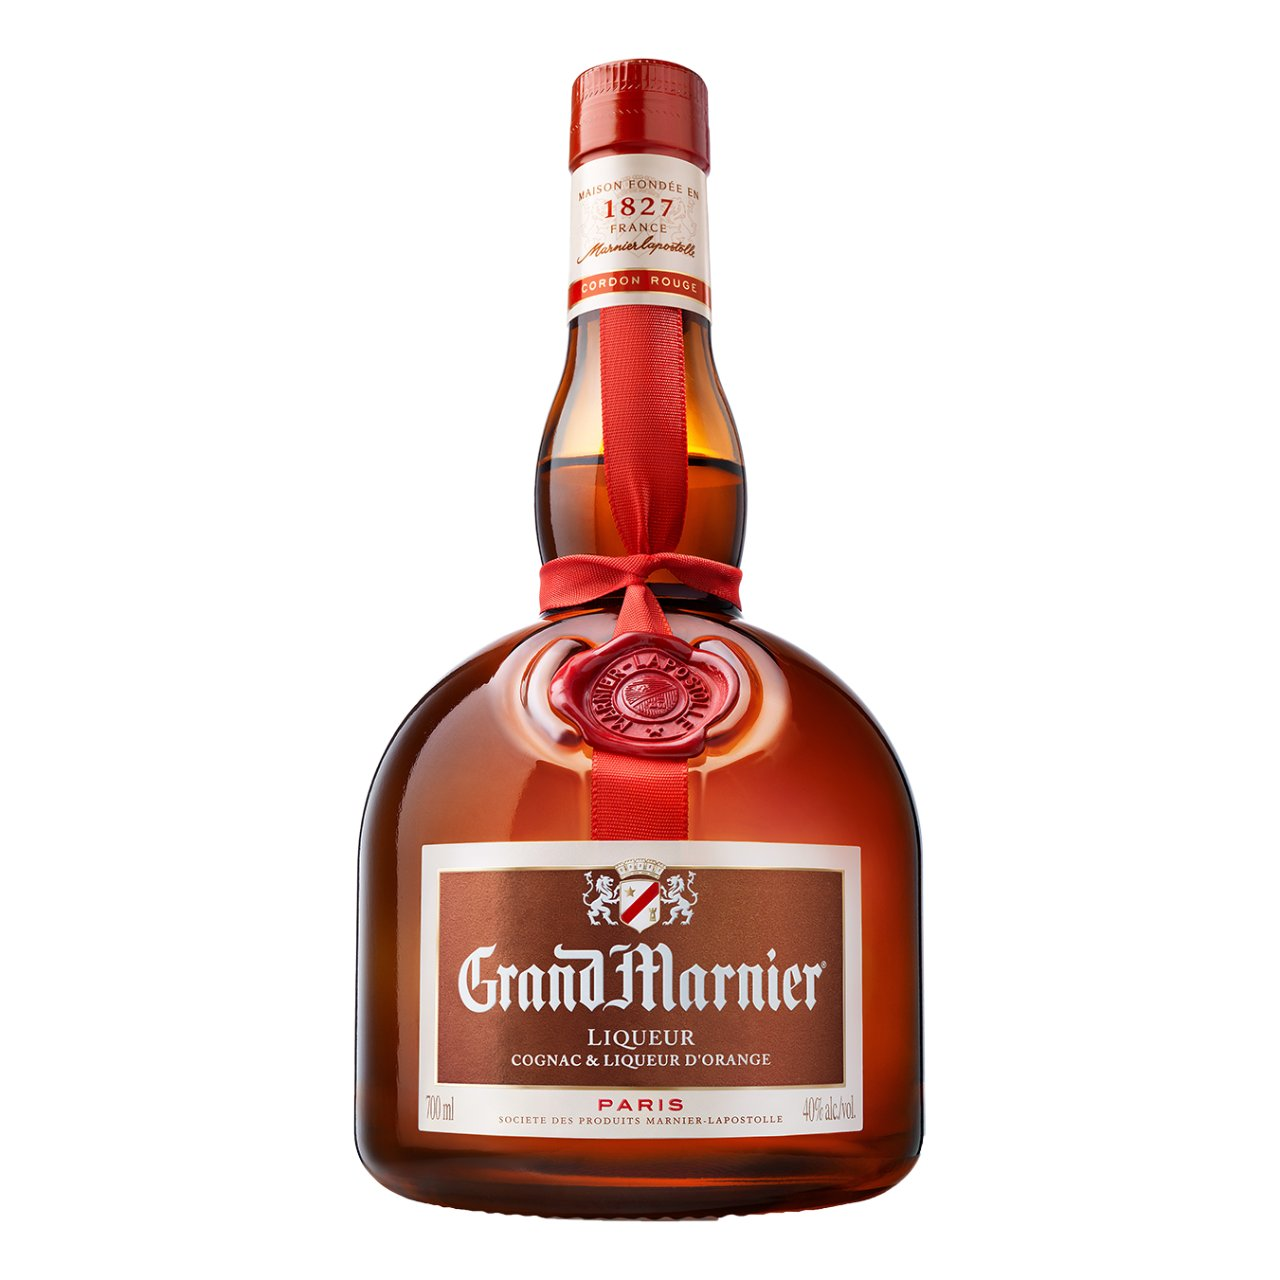 Grand Marnier Likeur orange & cognac Fles 70 cl | Sligro.nl